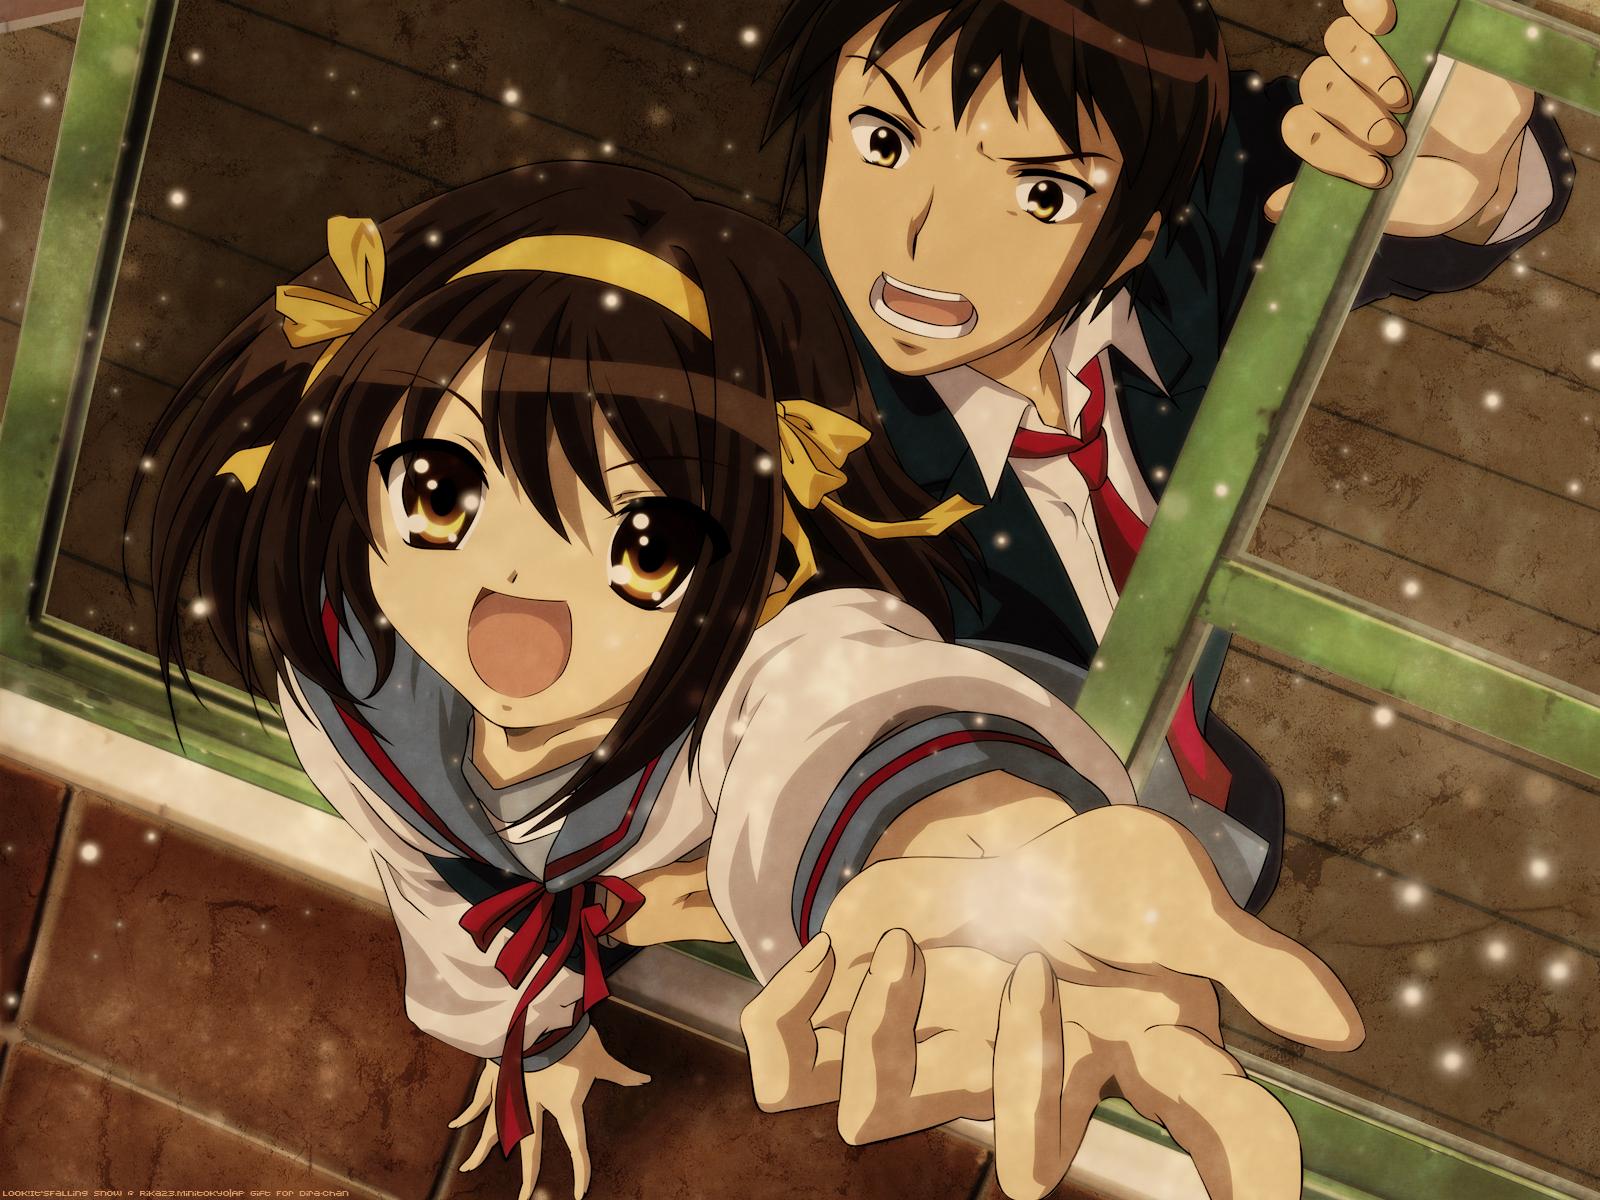 bow brown_eyes brown_hair headband kyon male ribbons school_uniform short_hair snow suzumiya_haruhi suzumiya_haruhi_no_yuutsu tie